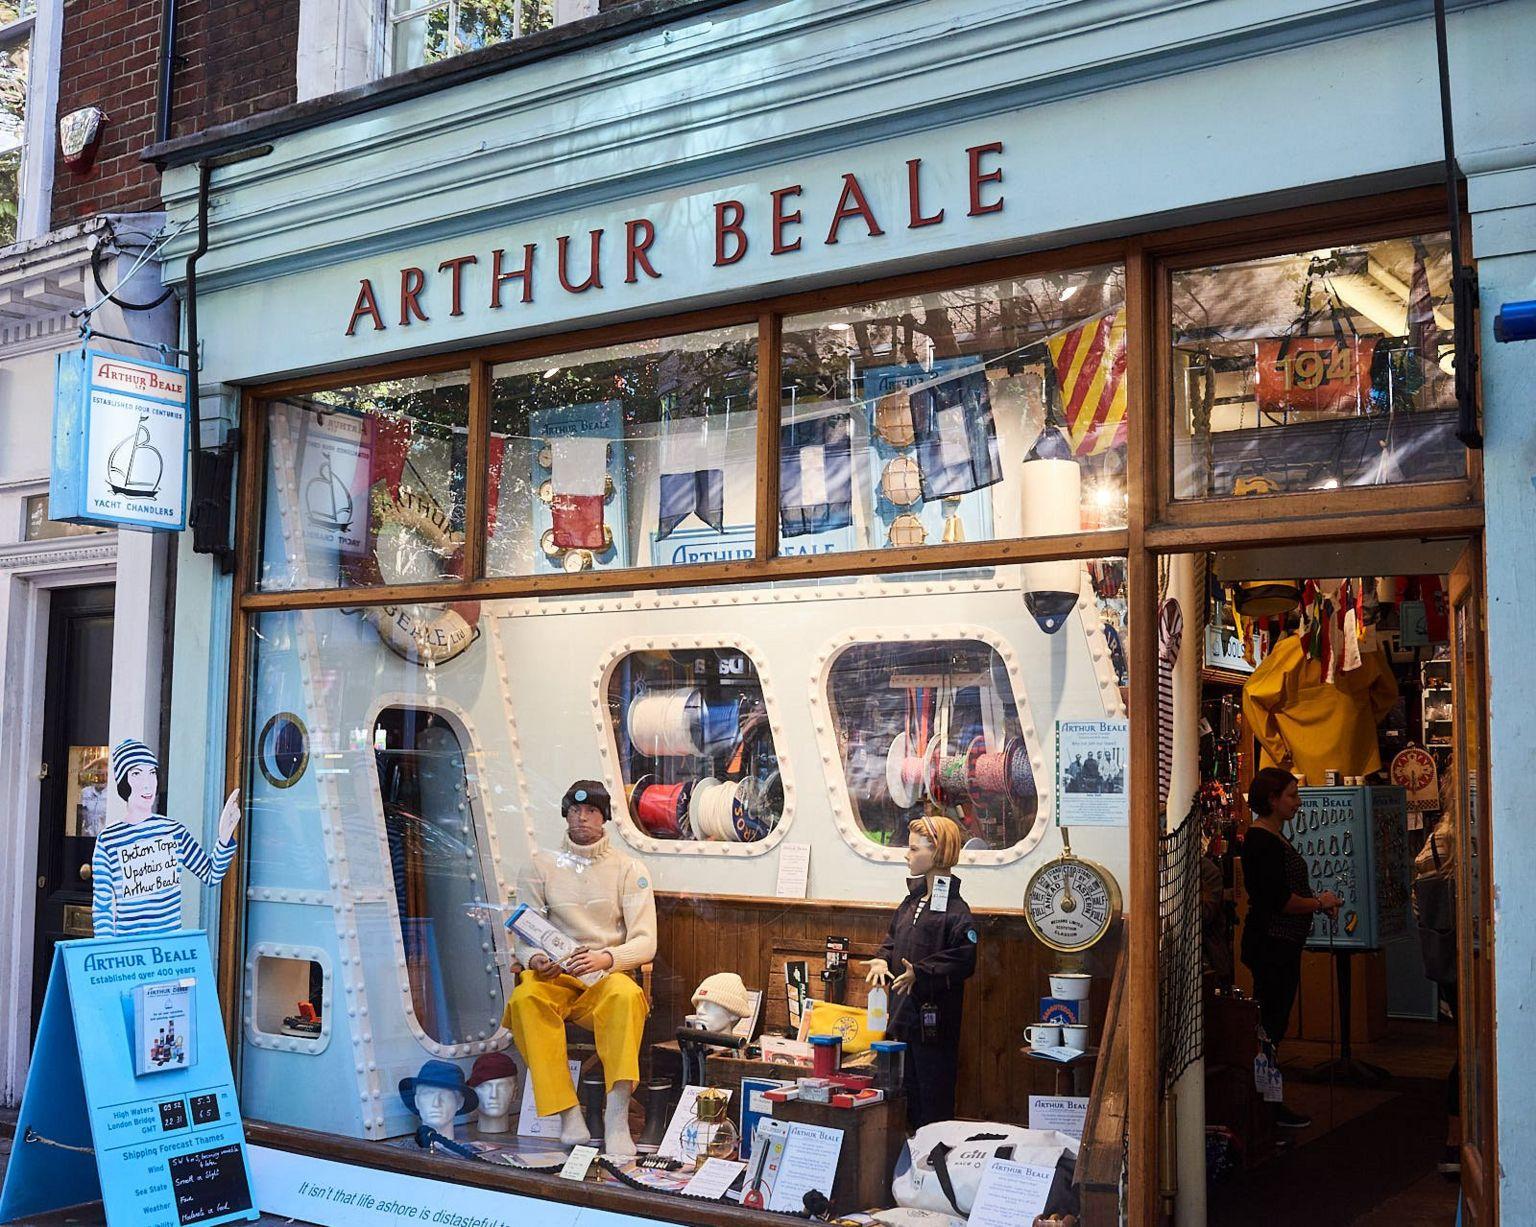 Arthur Beale yacht chandler